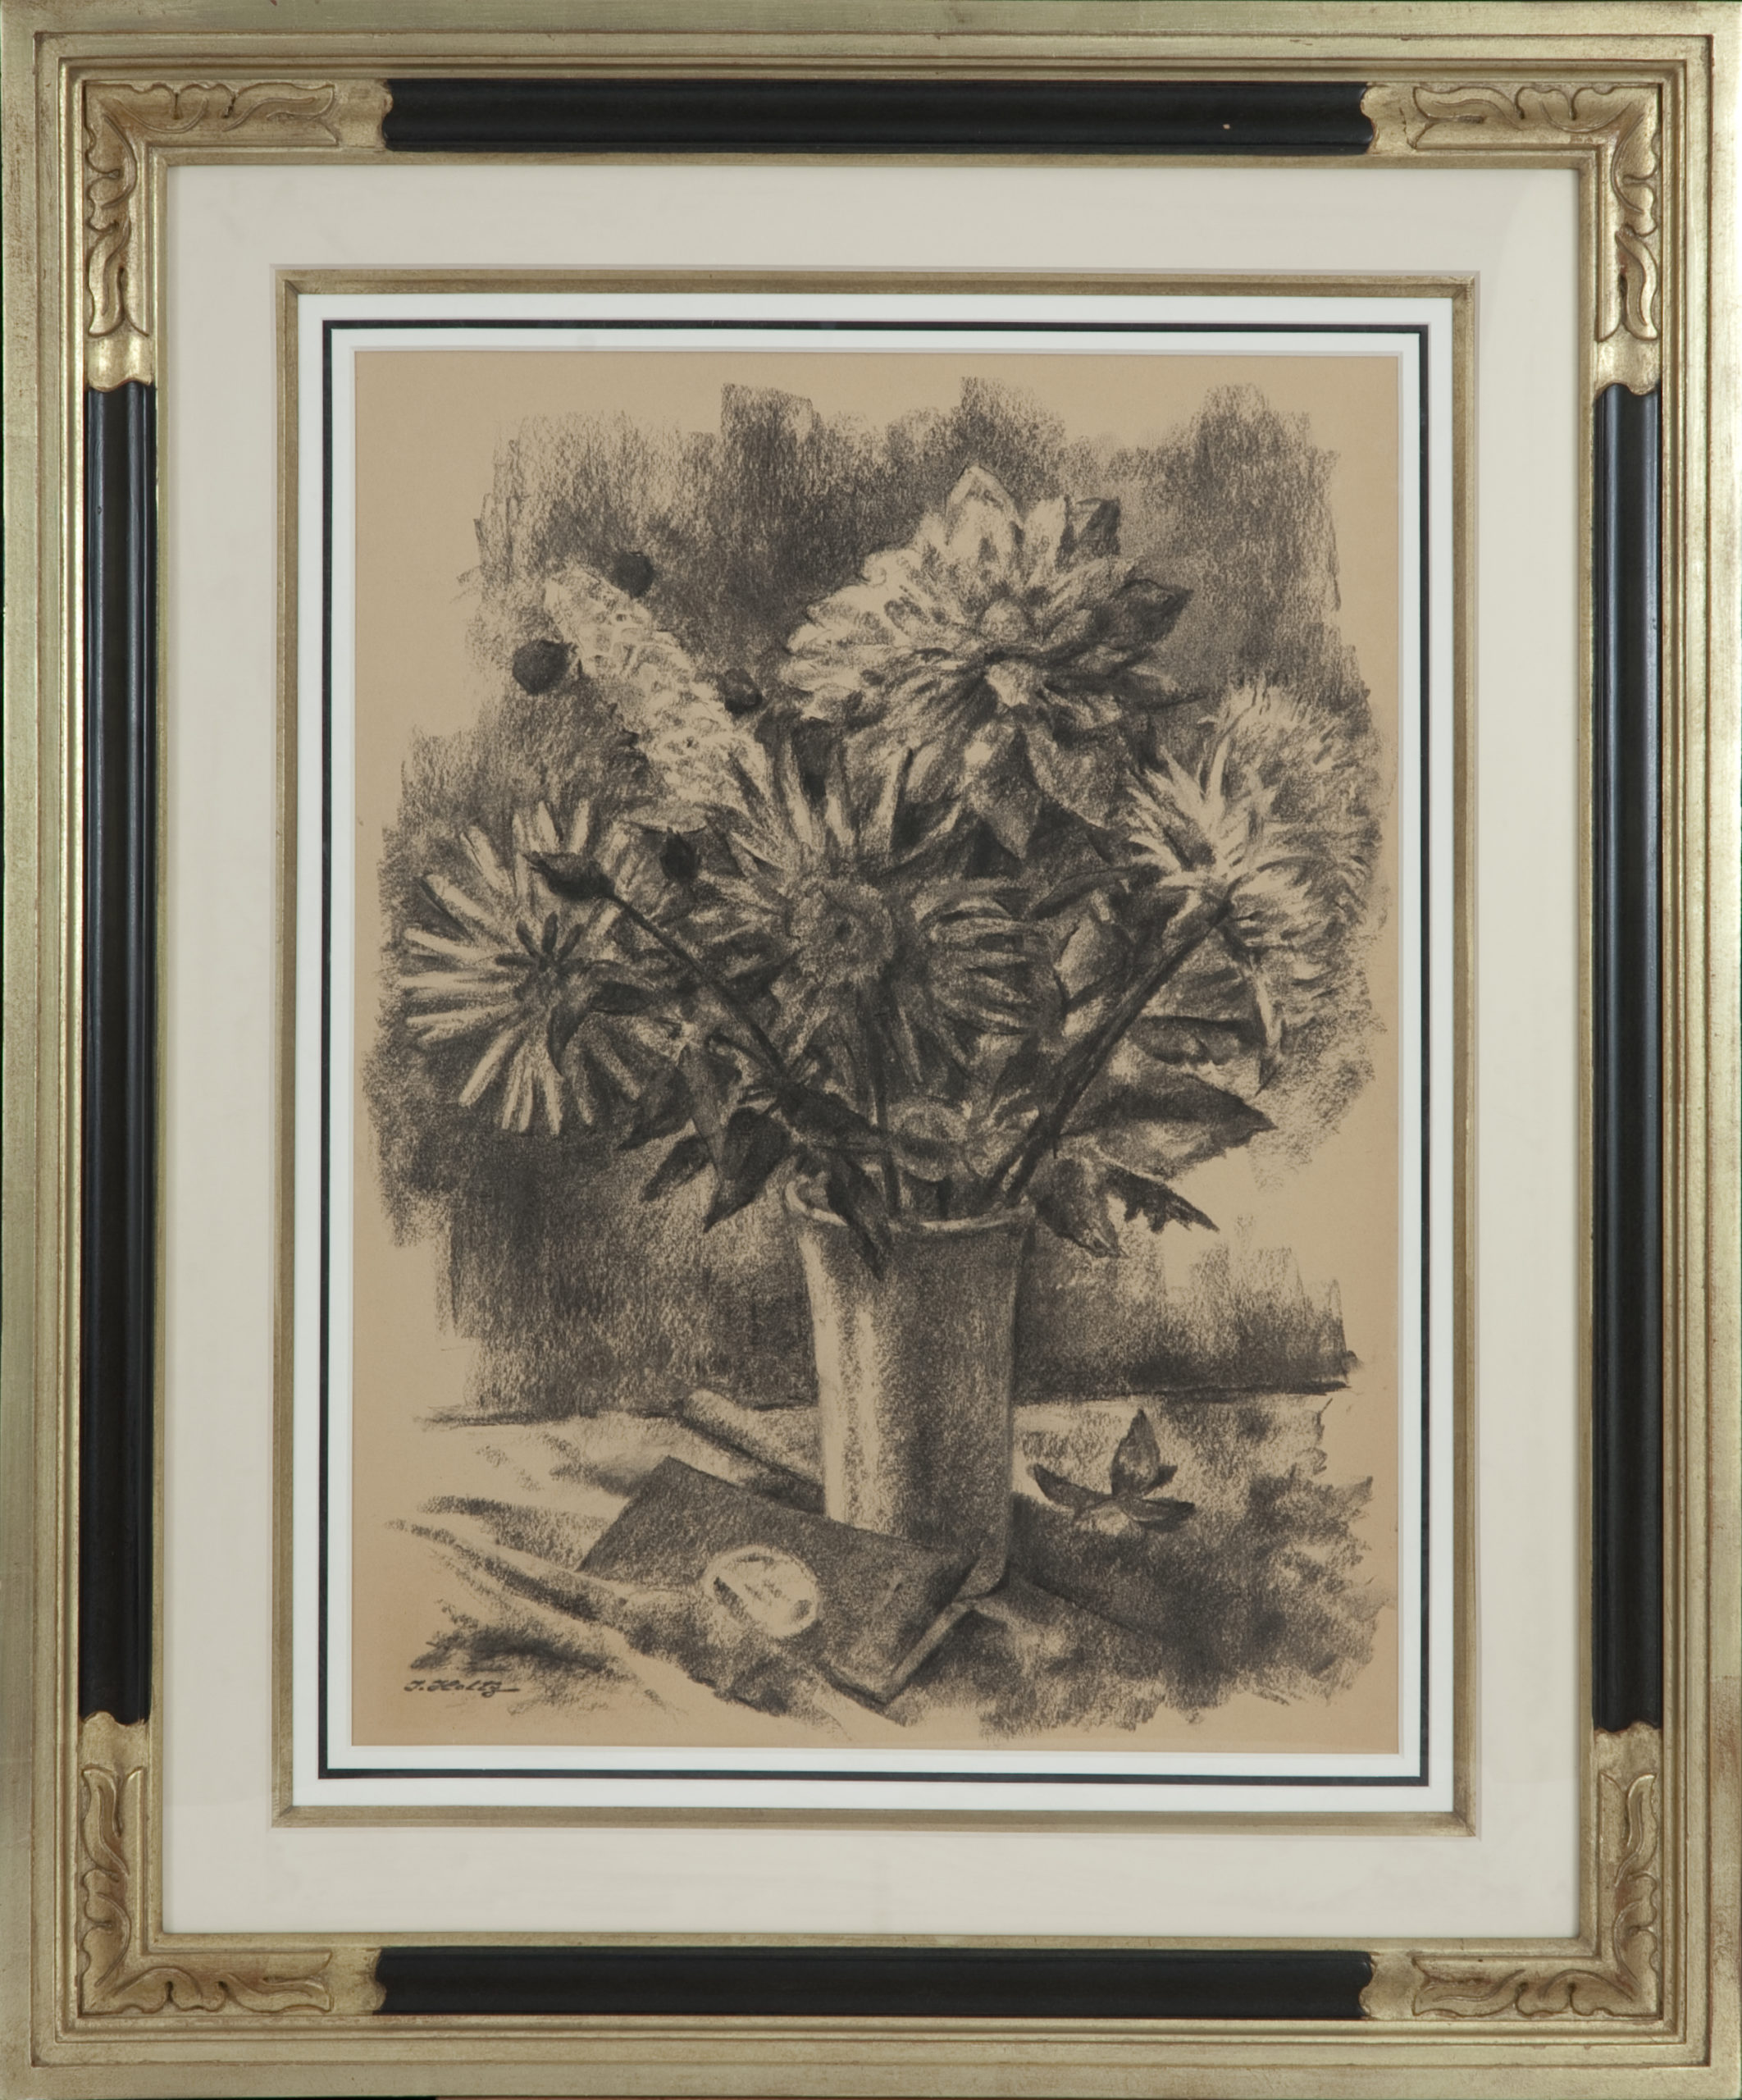 088 Floral Arrangement 1960 - Charcoal - 18 x 24 - Frame: 29 x 36 x 2